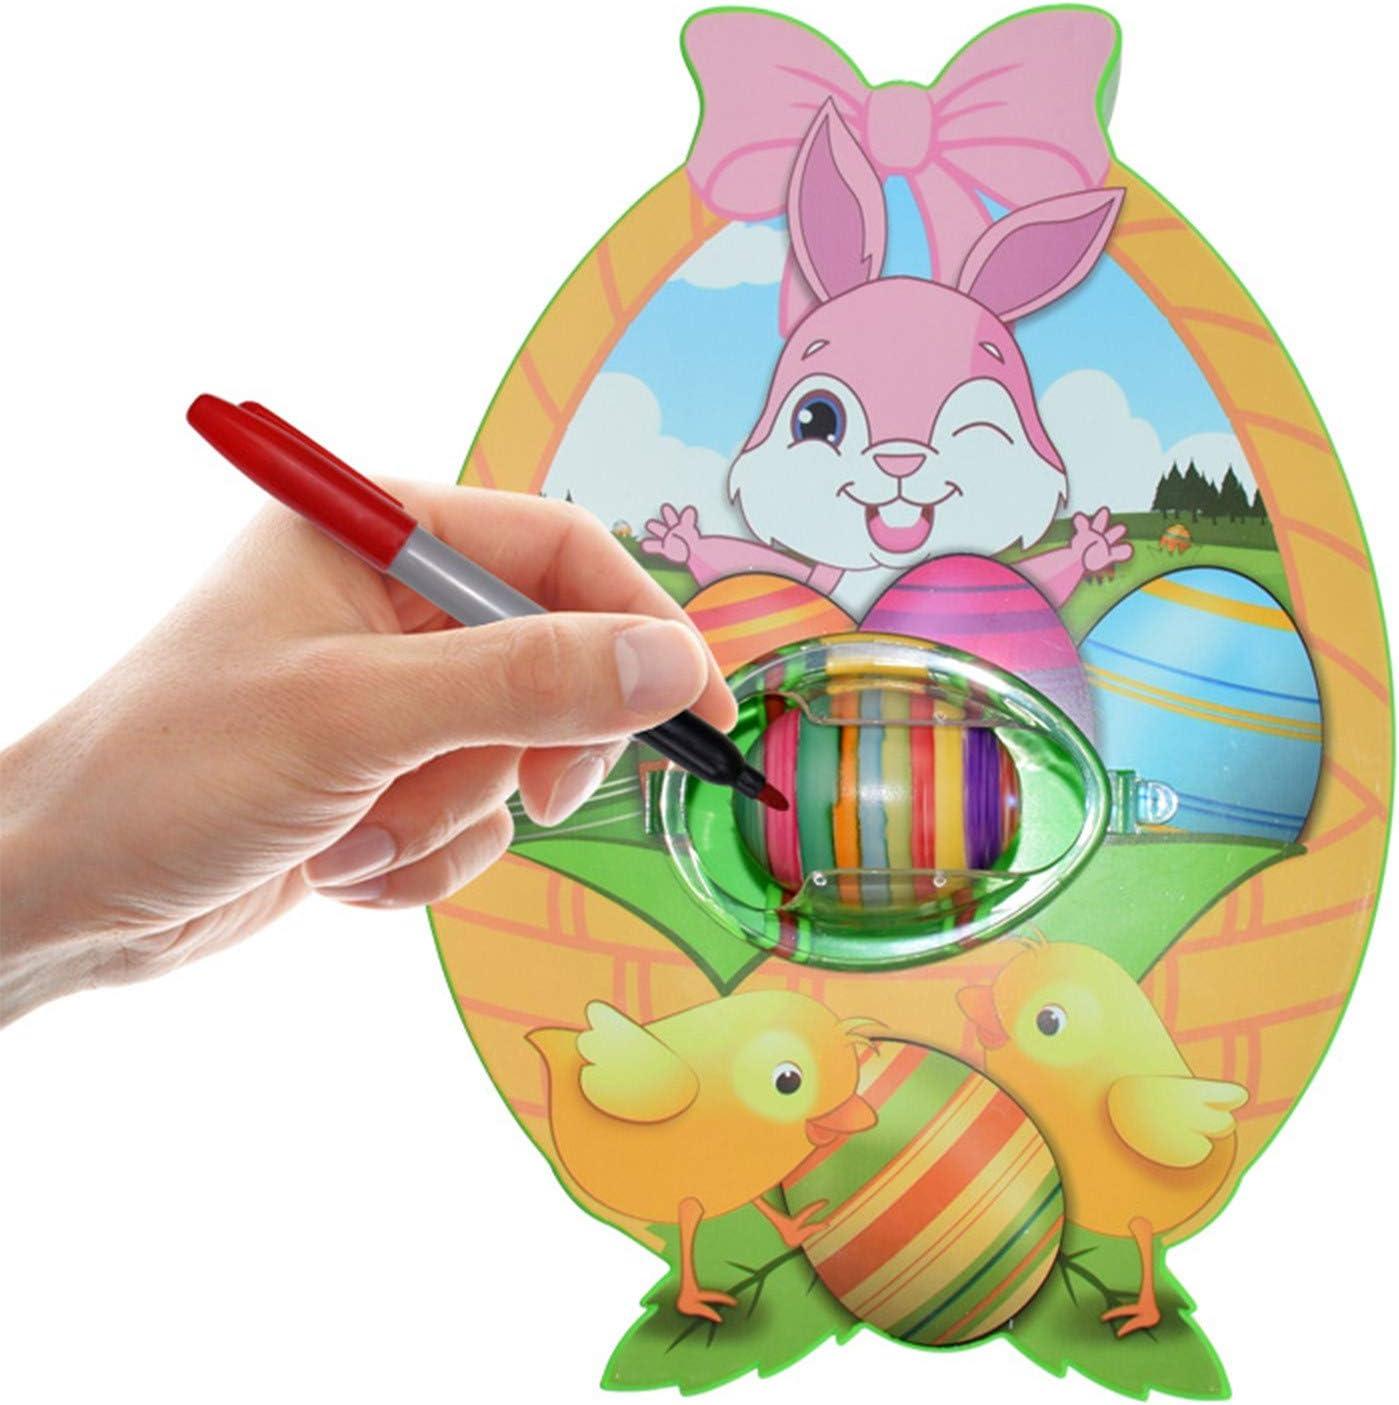 Ostereier Set Automatisch mit 8er Markern /& 3er Ostereier Plastik Ostereier Dekorieren Geschenk f/ür Kinder Ostereier Malmaschine zum Bemalen Eier Bemal Maschine mit LED /& Musik